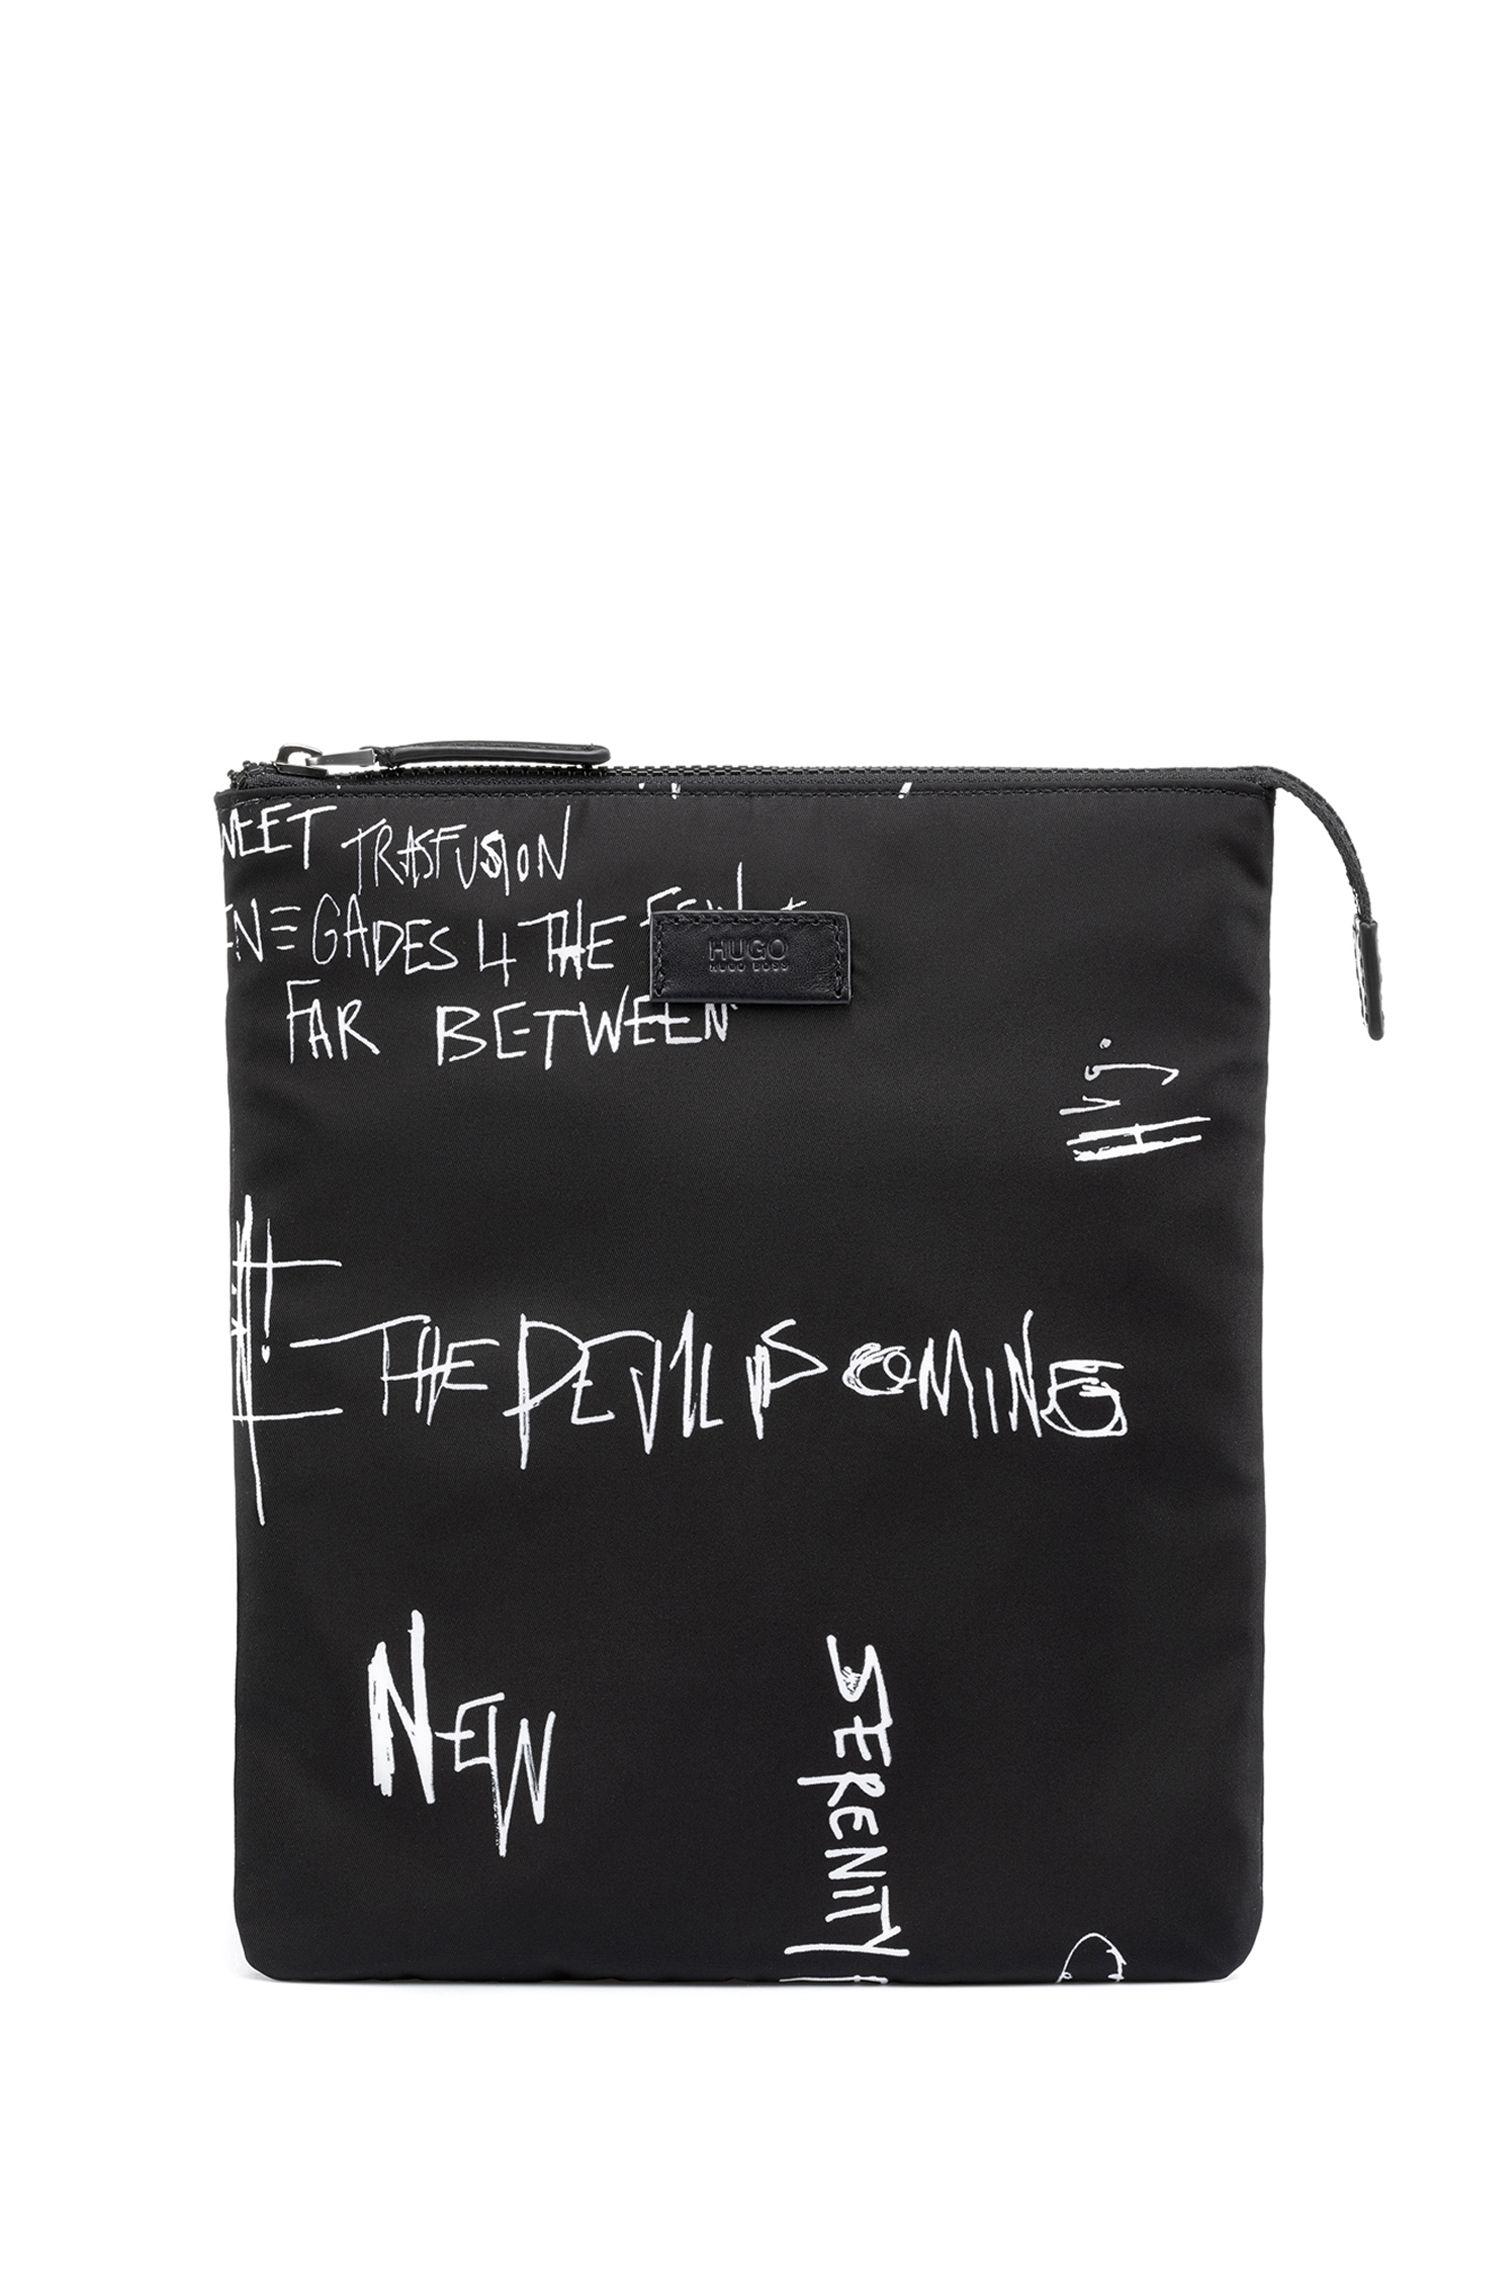 Kurier-Tasche aus Nylon-Gabardine mit Graffiti-Print